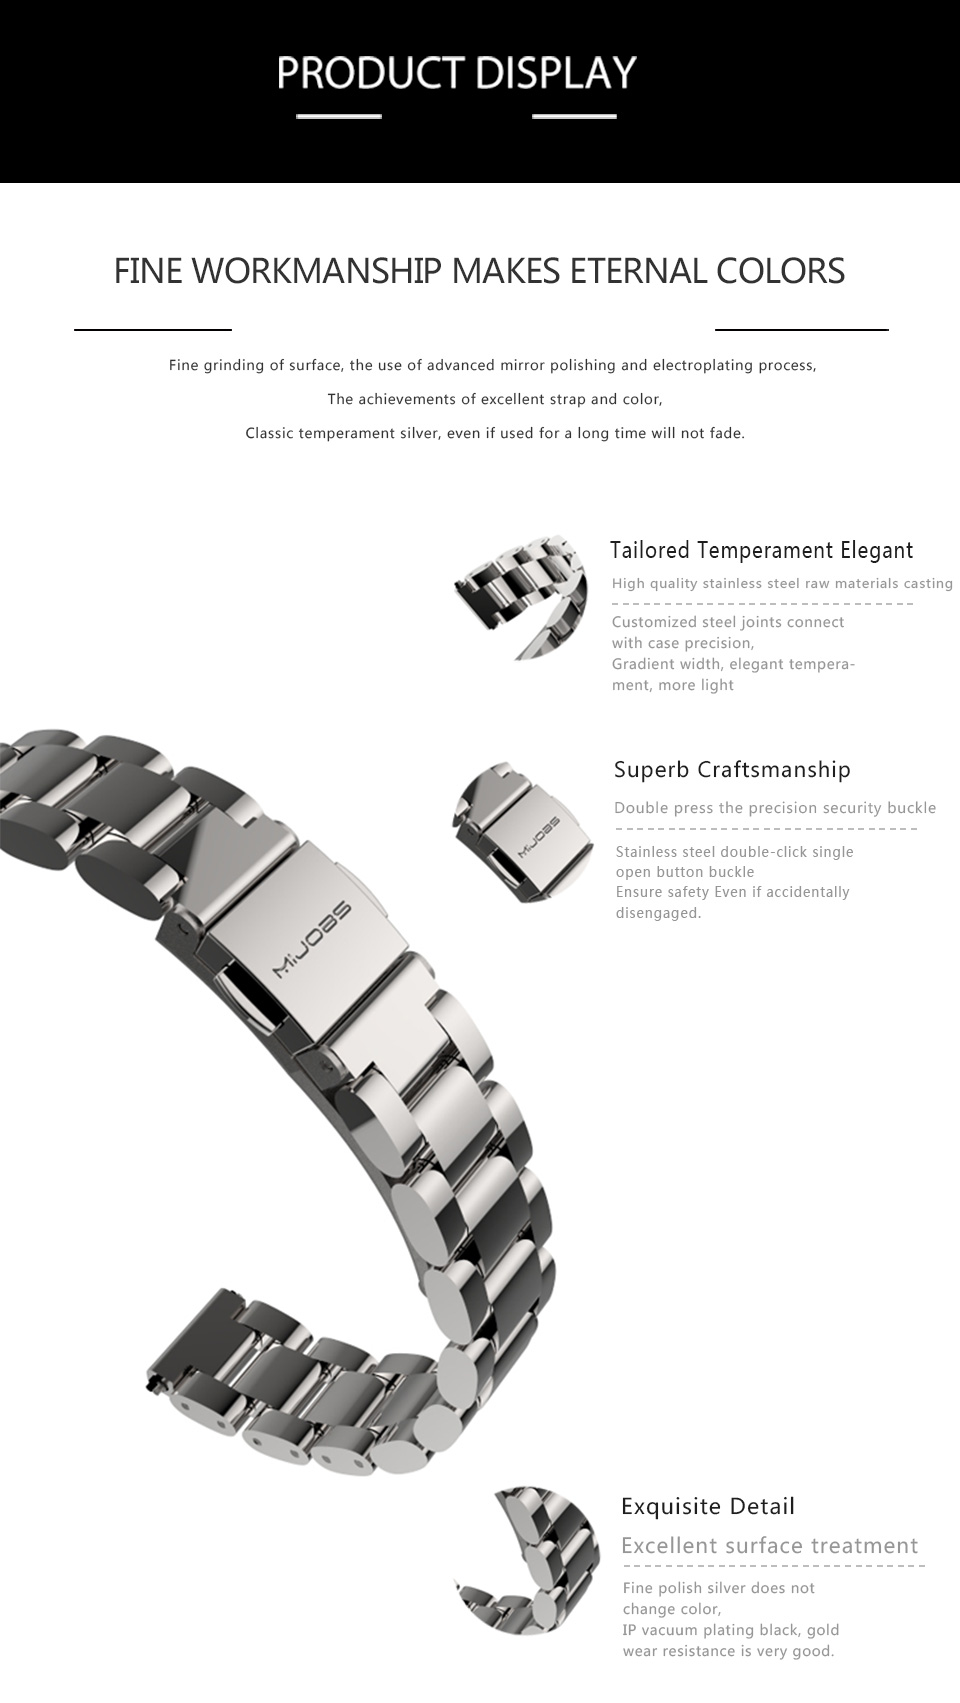 Original Stainless Steel Metal Plus Fitbit Free tool Xiaomi miband 2 Smart Bracelet Replacement Fitness Tracker mi Accessories 7